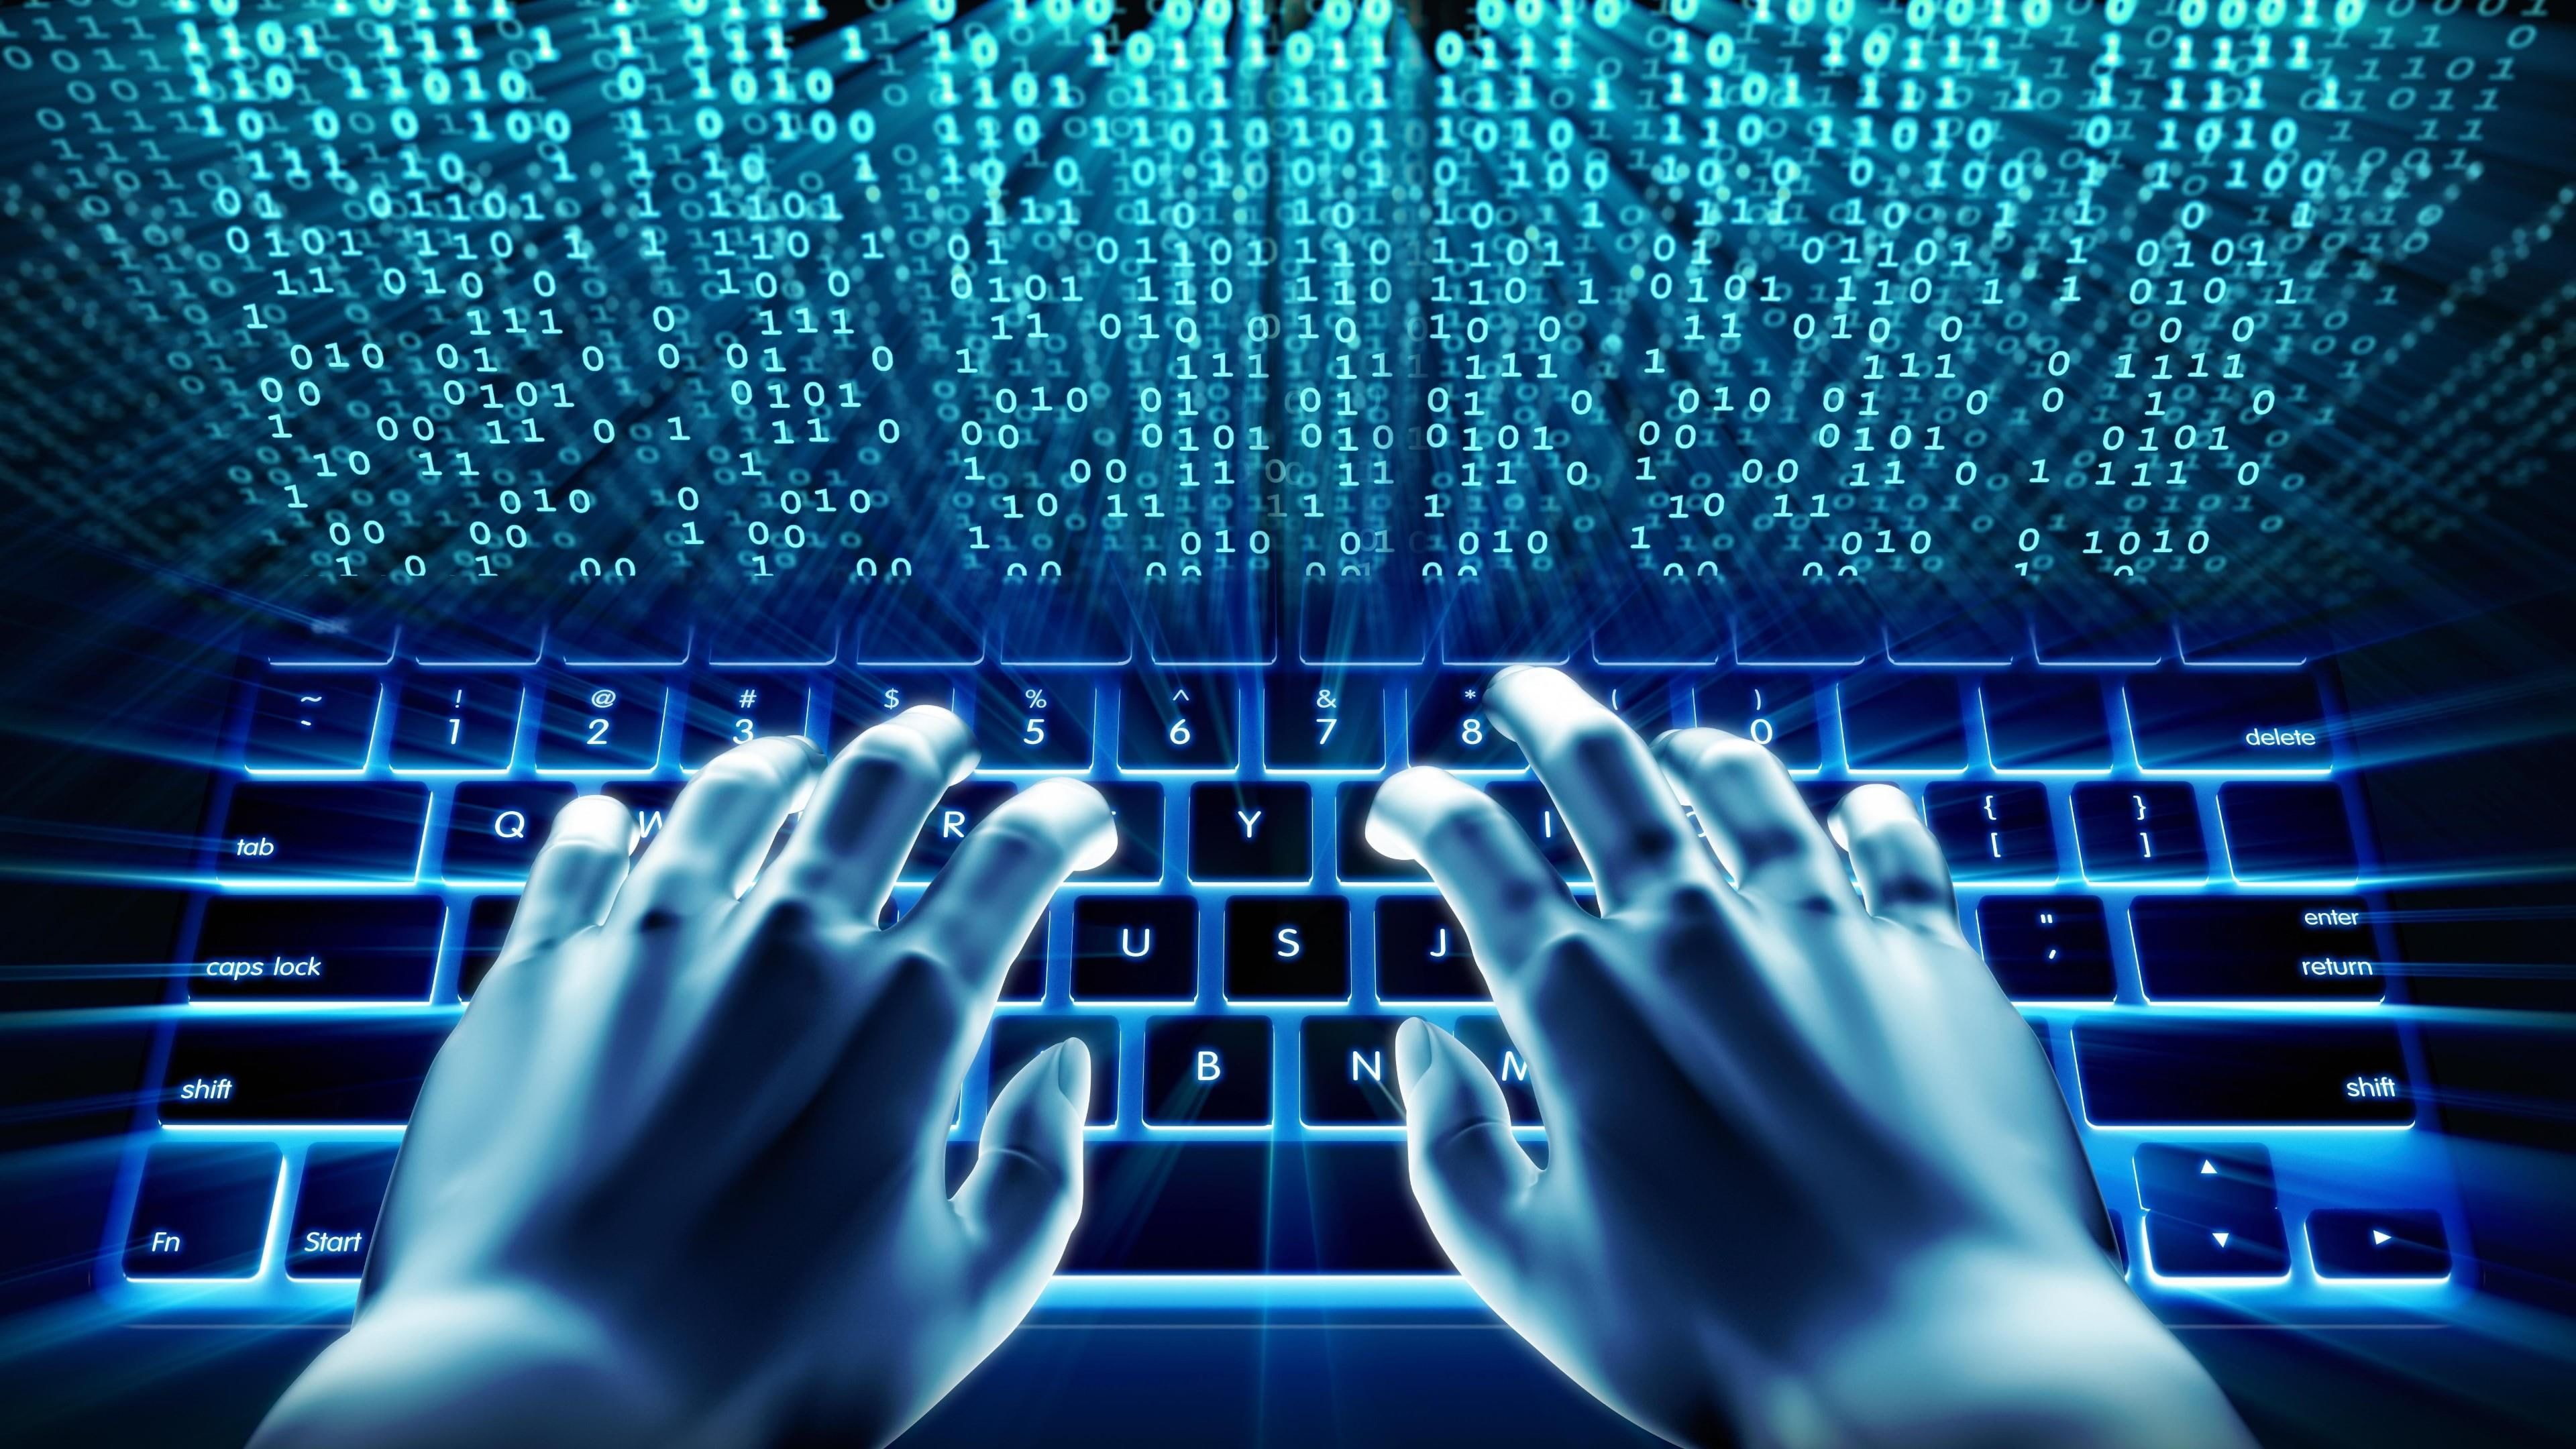 Digital Computer Wallpaper Sparkling Rain In Blue Desktop Design Desktop Design Computer Wallpaper Wallpaper